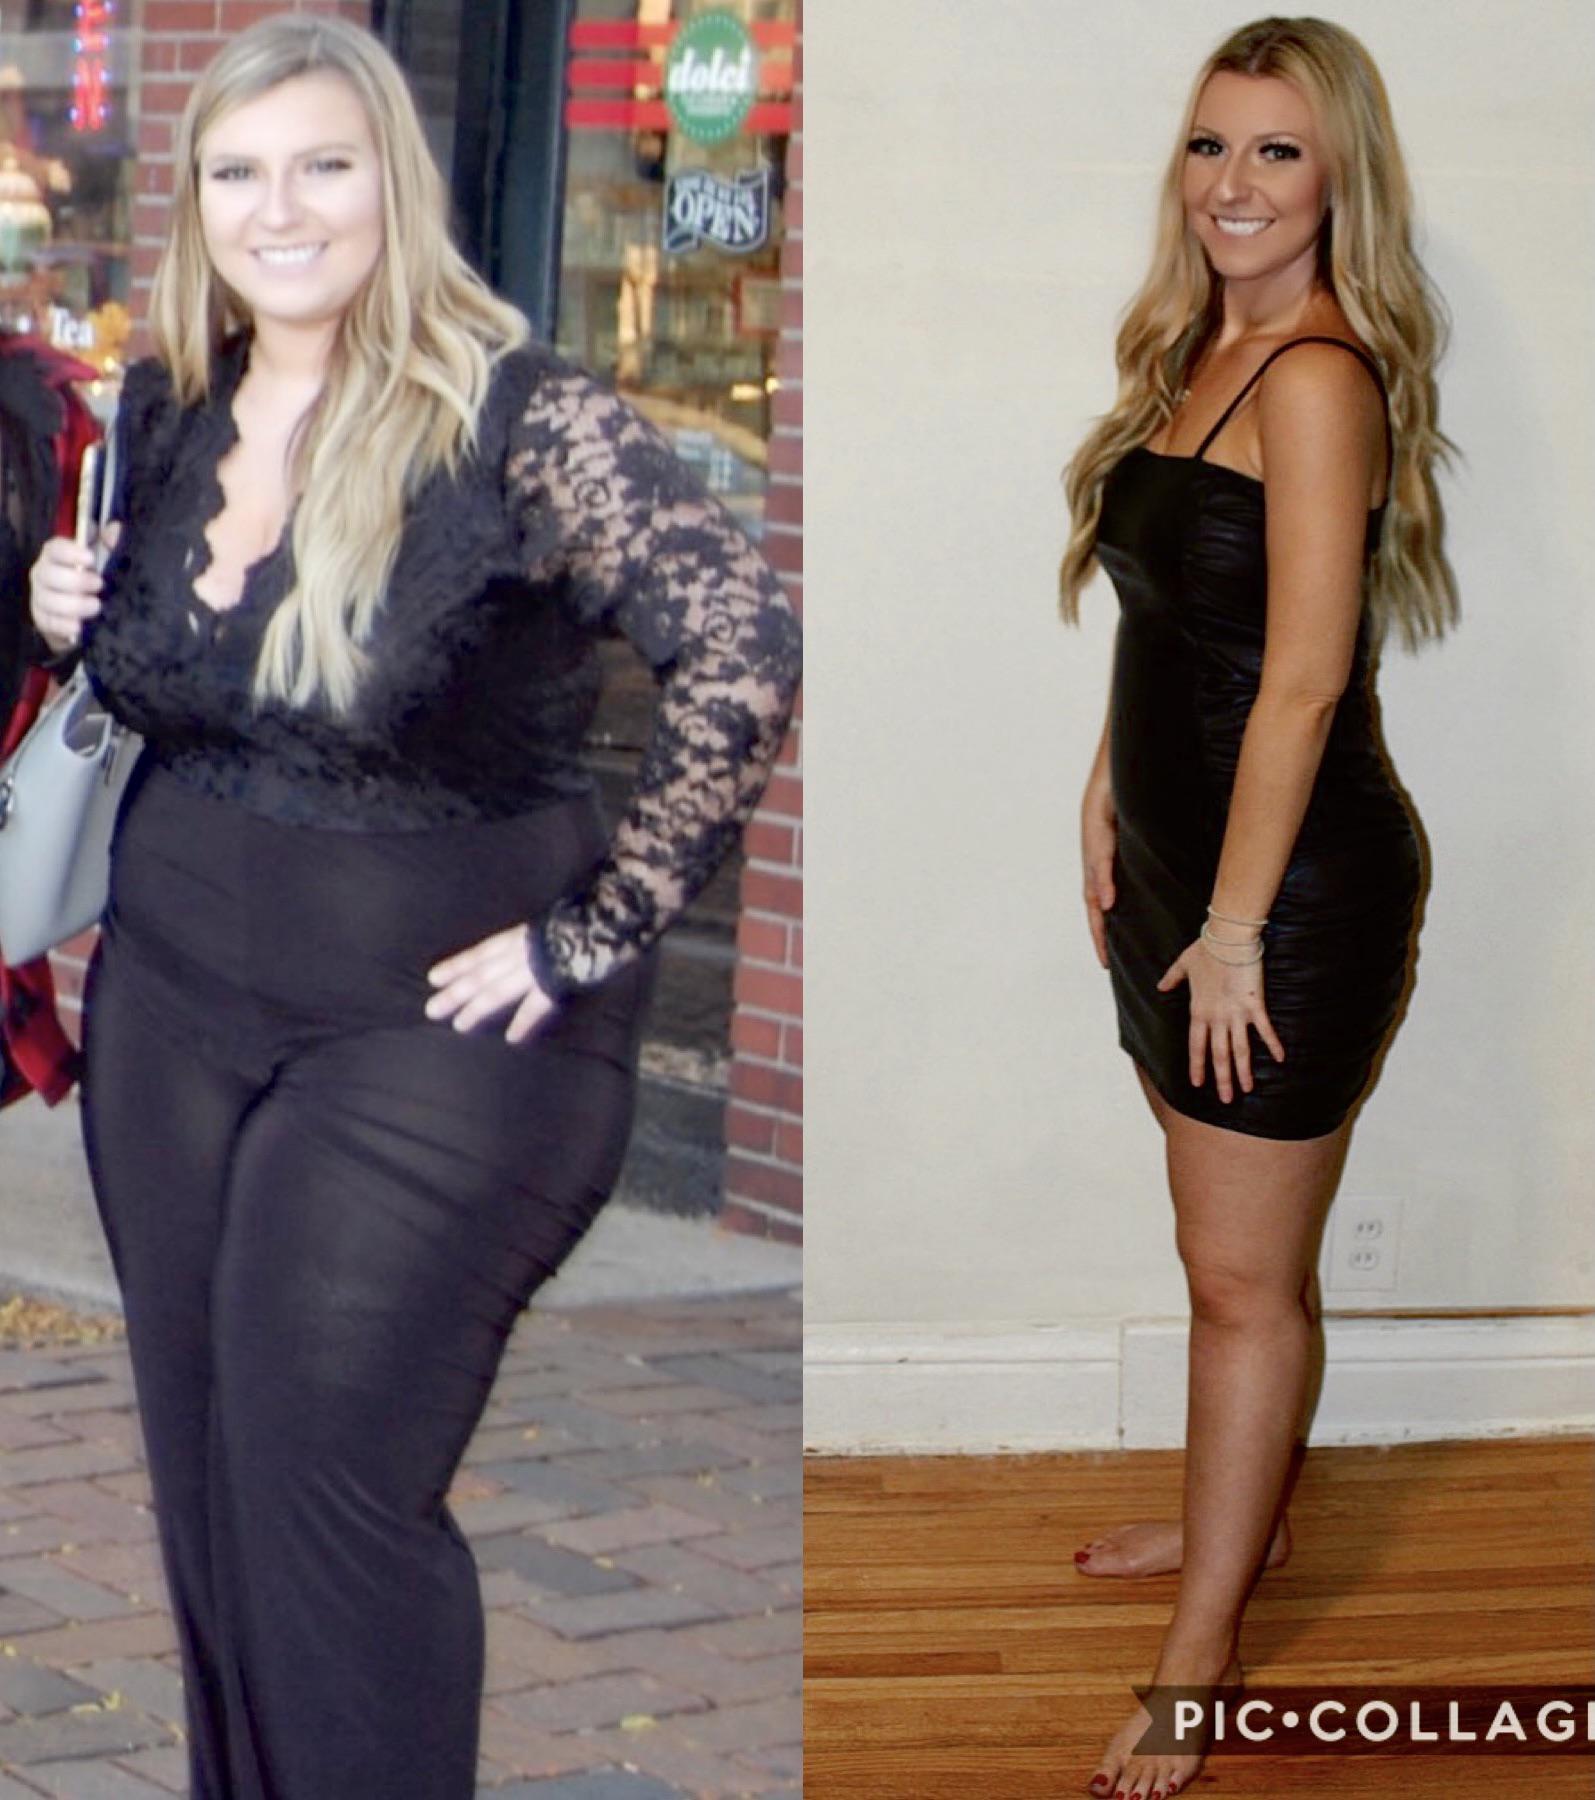 Progress Pics of 105 lbs Weight Loss 5 foot 5 Female 250 lbs to 145 lbs